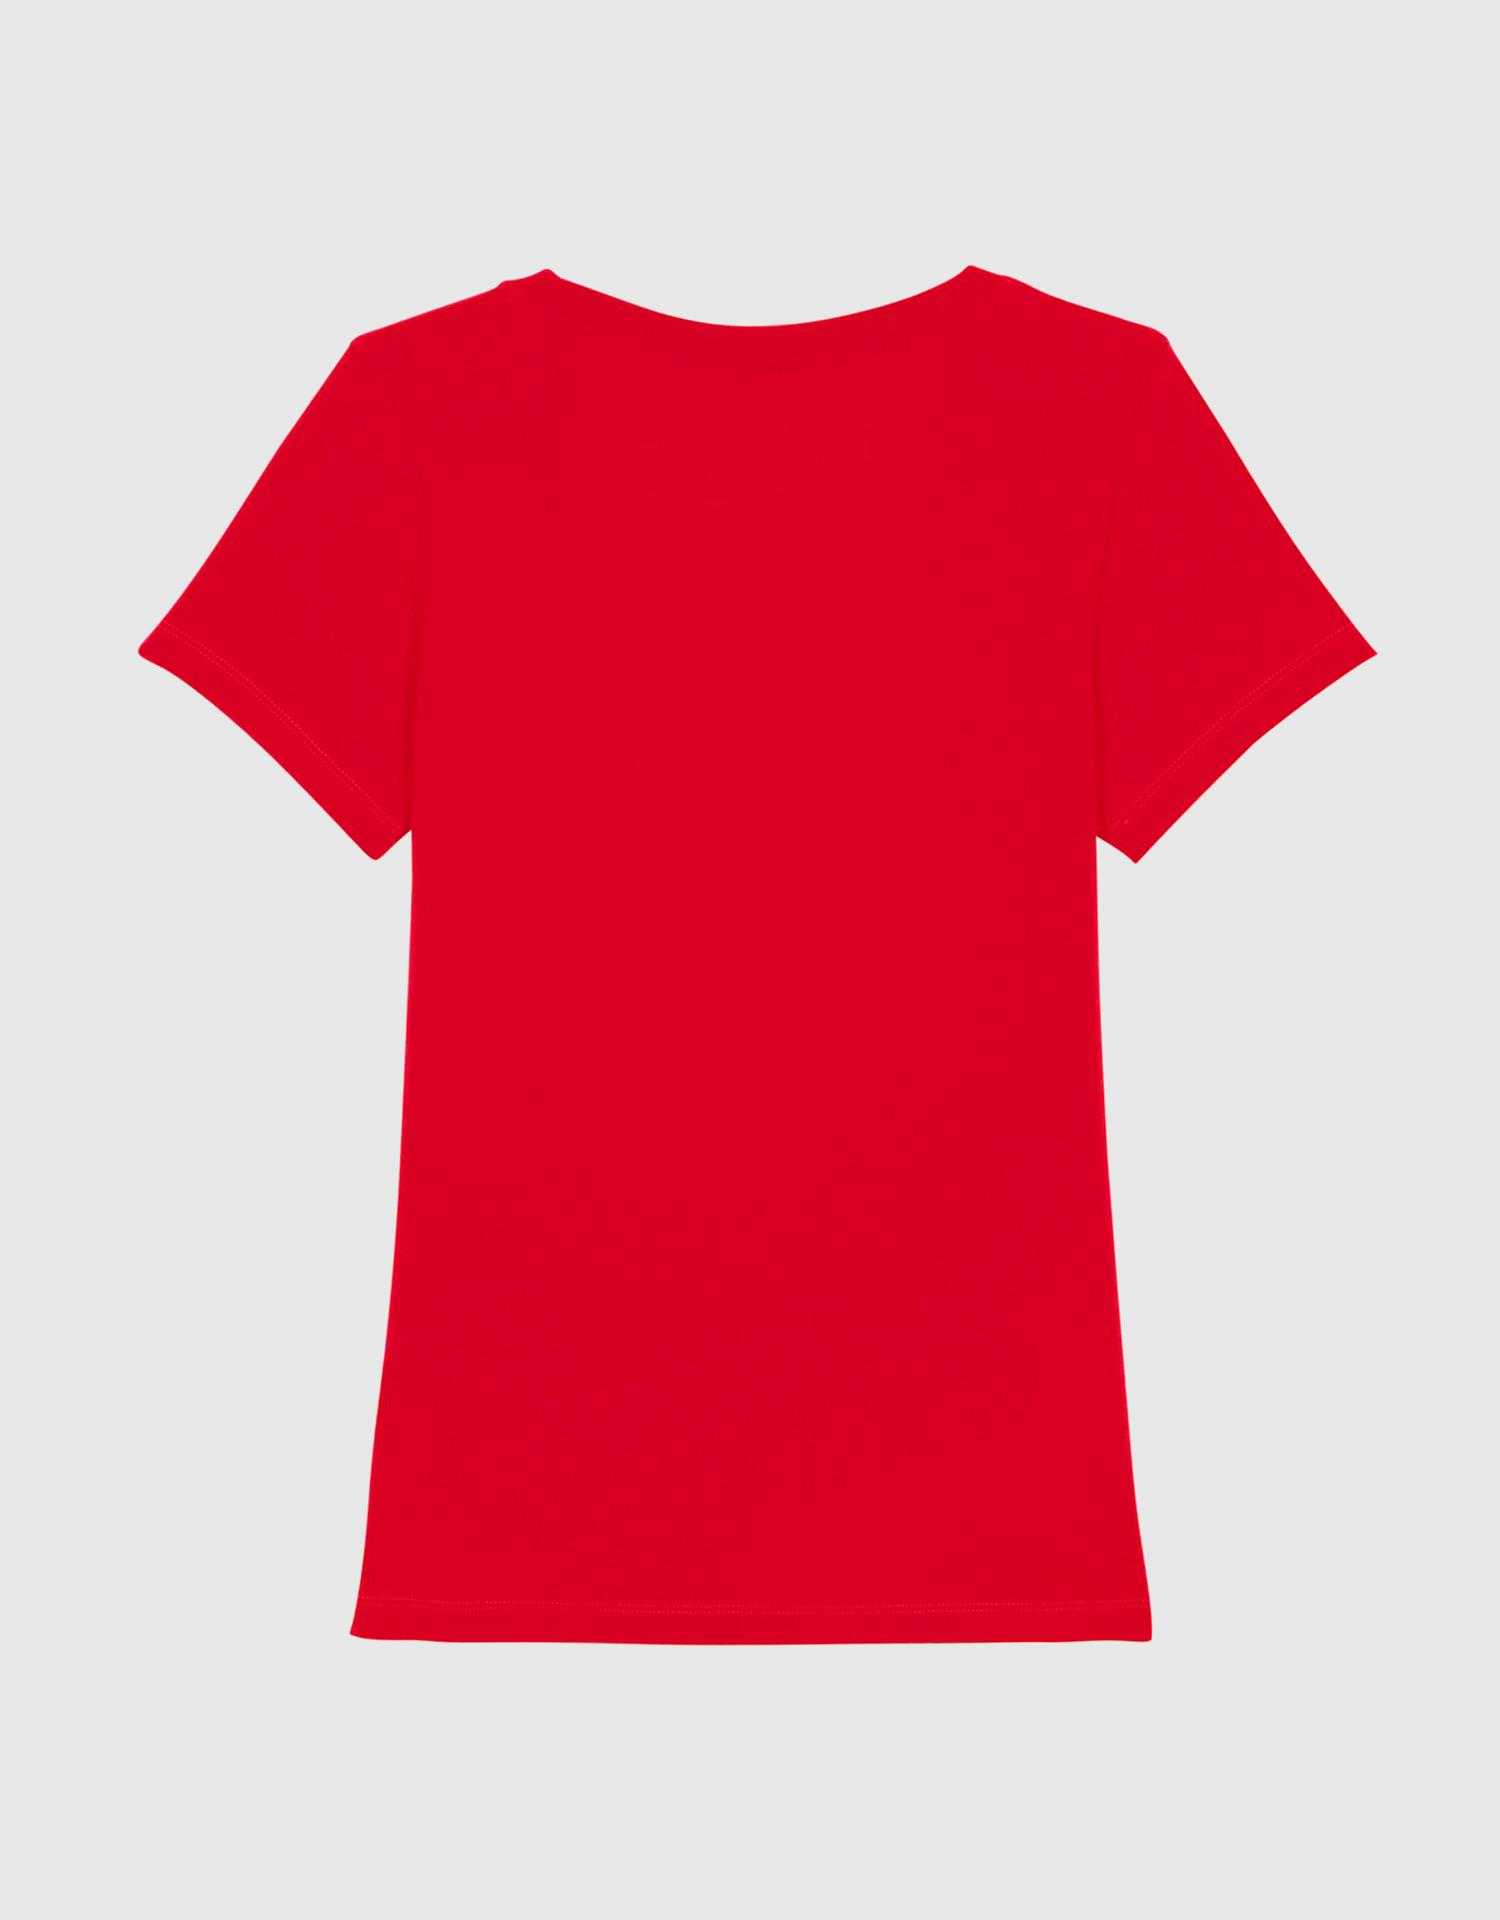 t-shirt organica free donna ninesquared